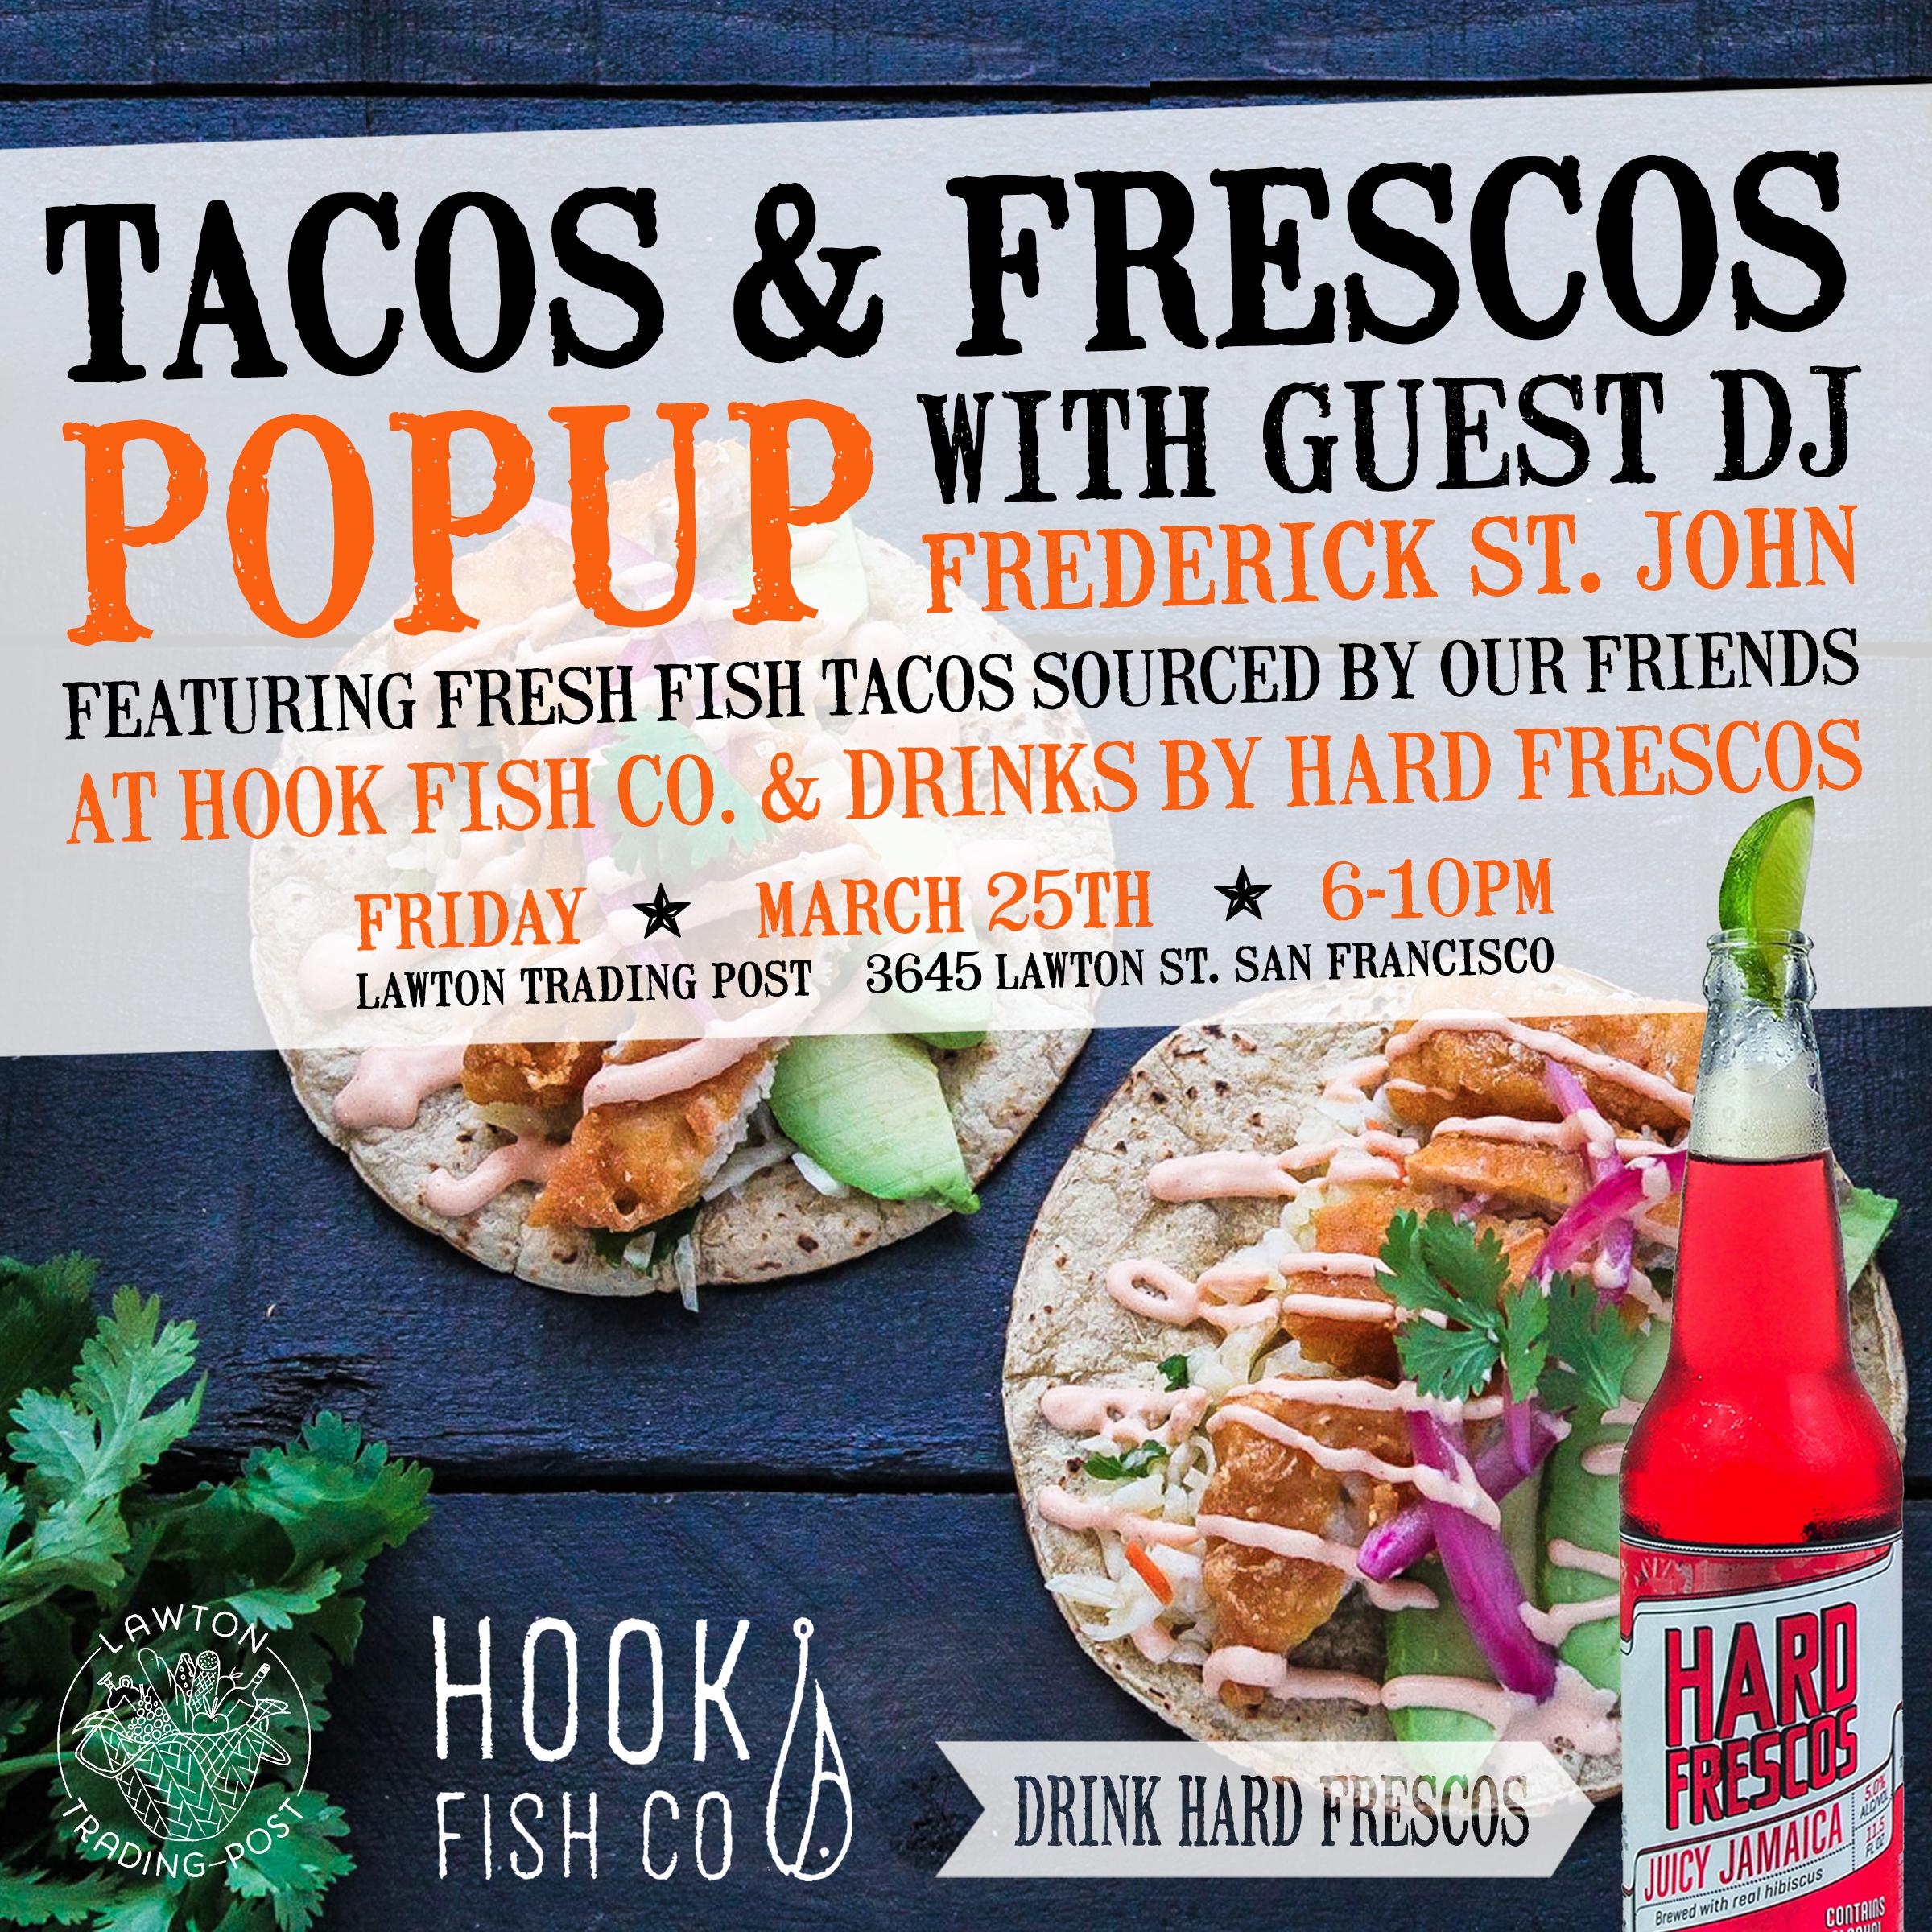 Tacos & Frescos Instagram 2 red.jpg